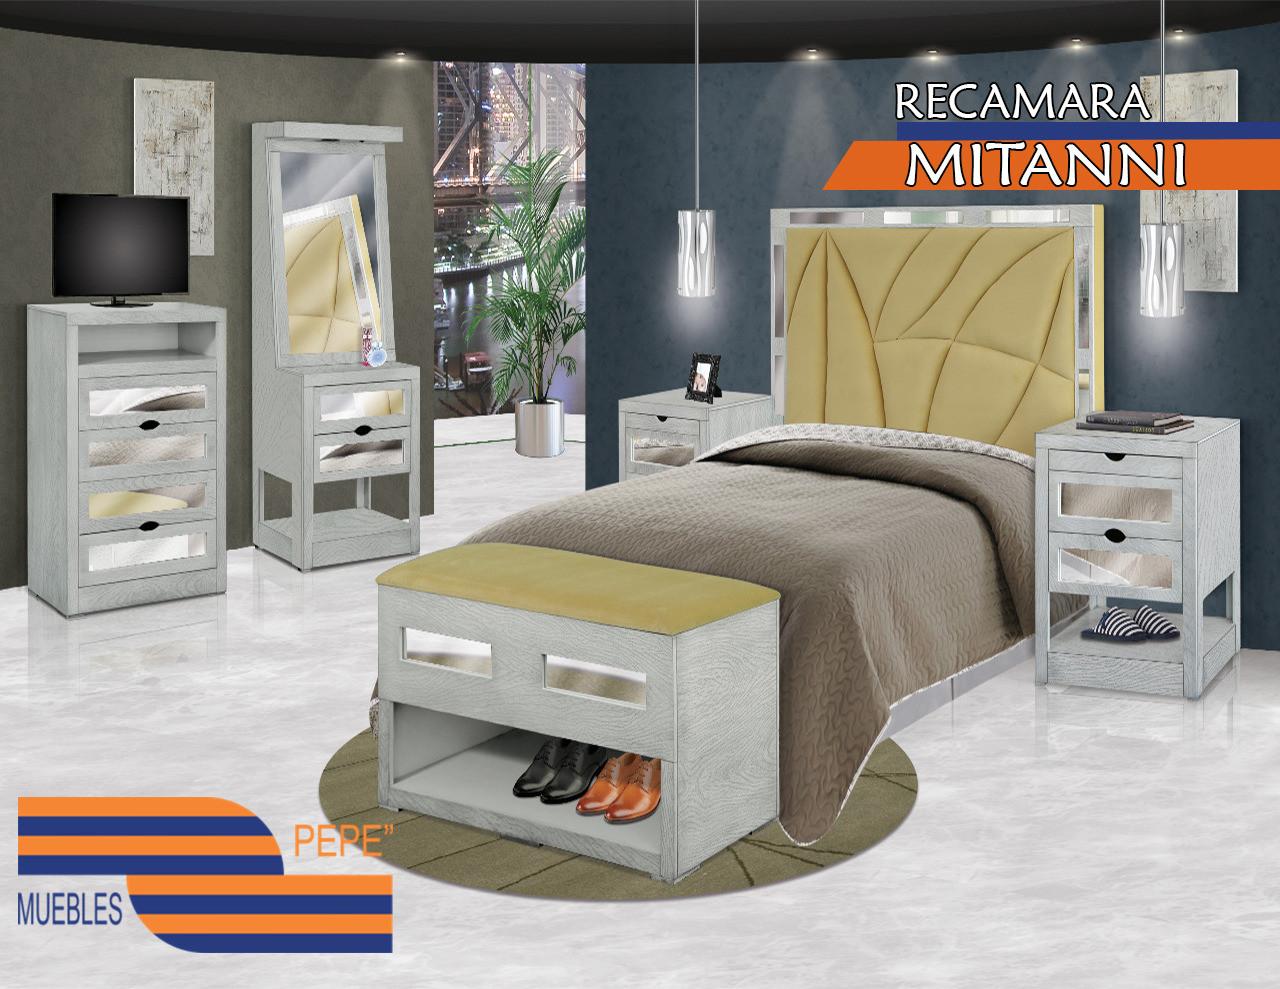 Recamara Mitanni